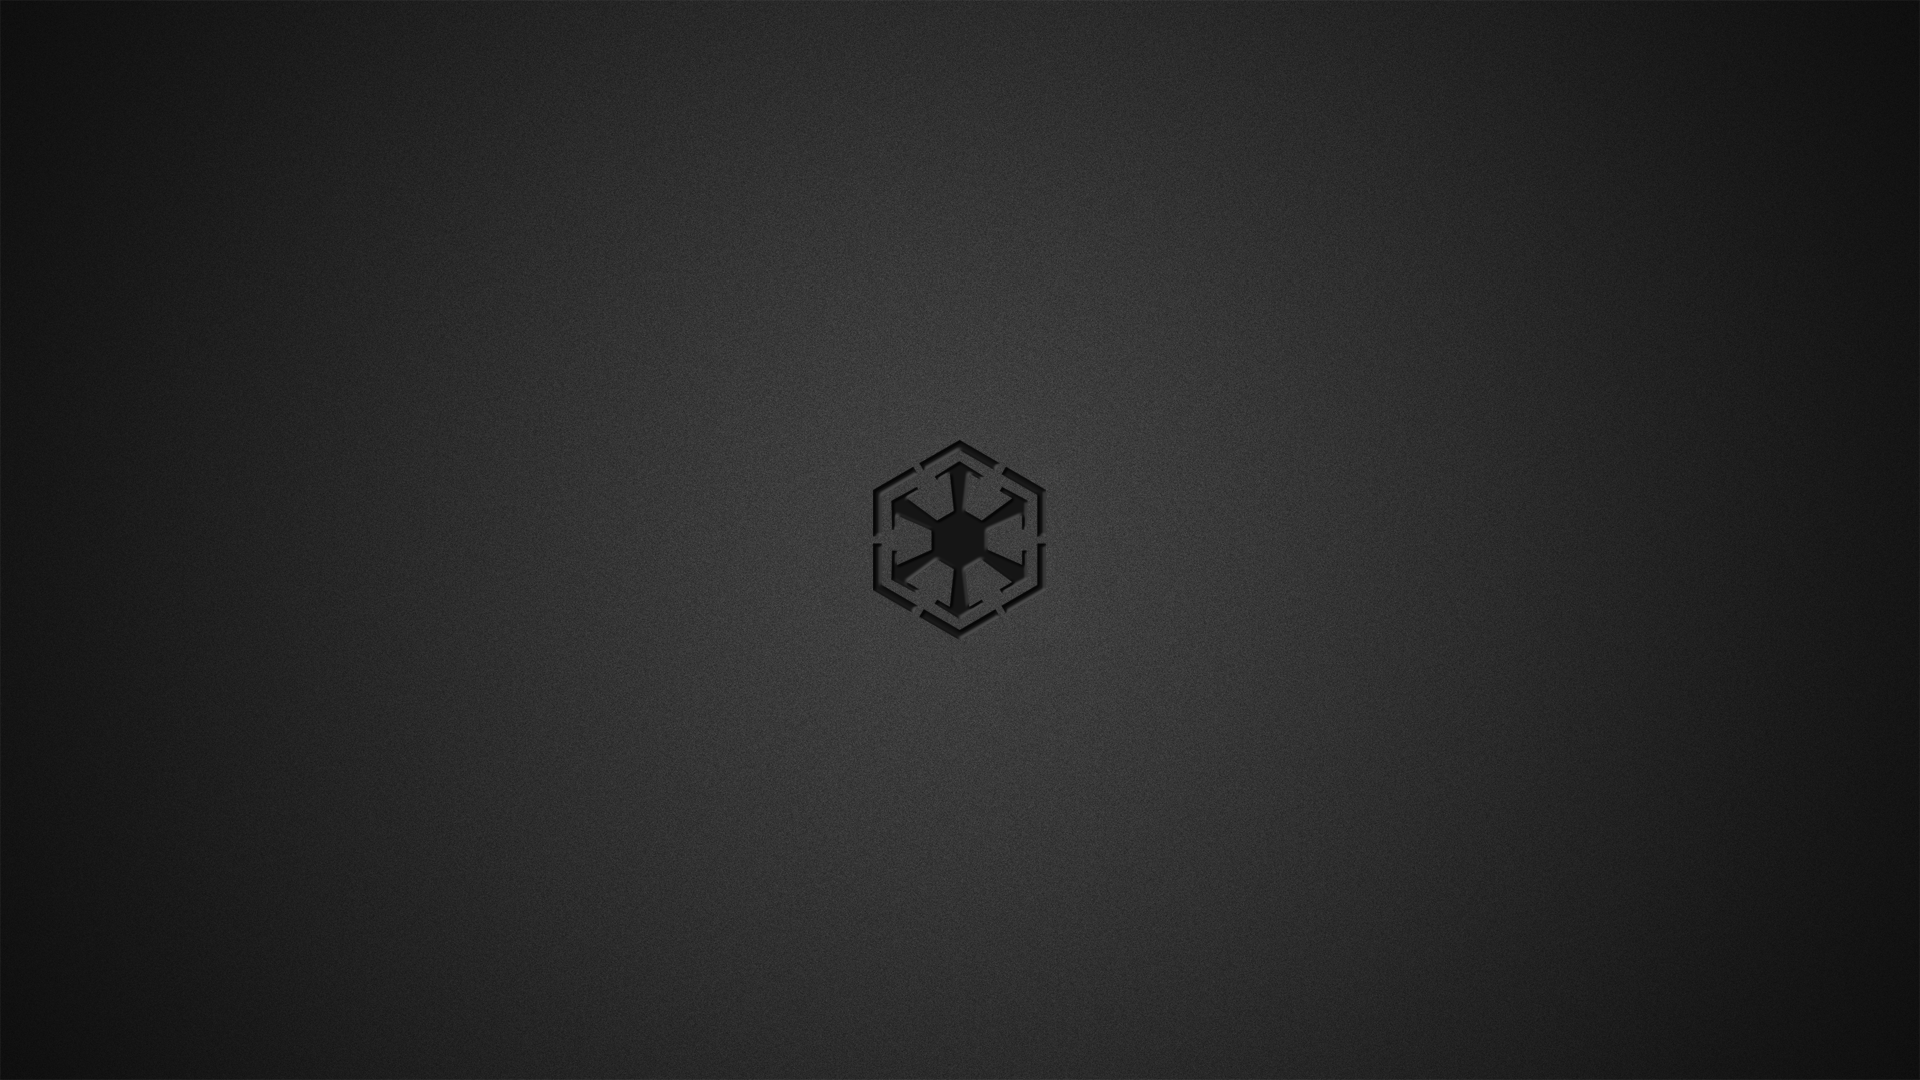 Star Wars Minimalism Monochrome Simple Background 1920x1080